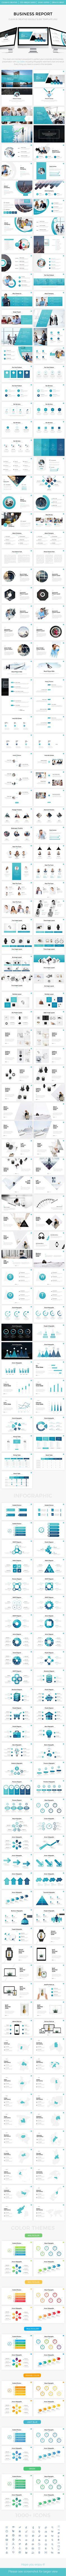 Business Anual Report Google Slide Template 2017 - Google Slides Presentation Templates